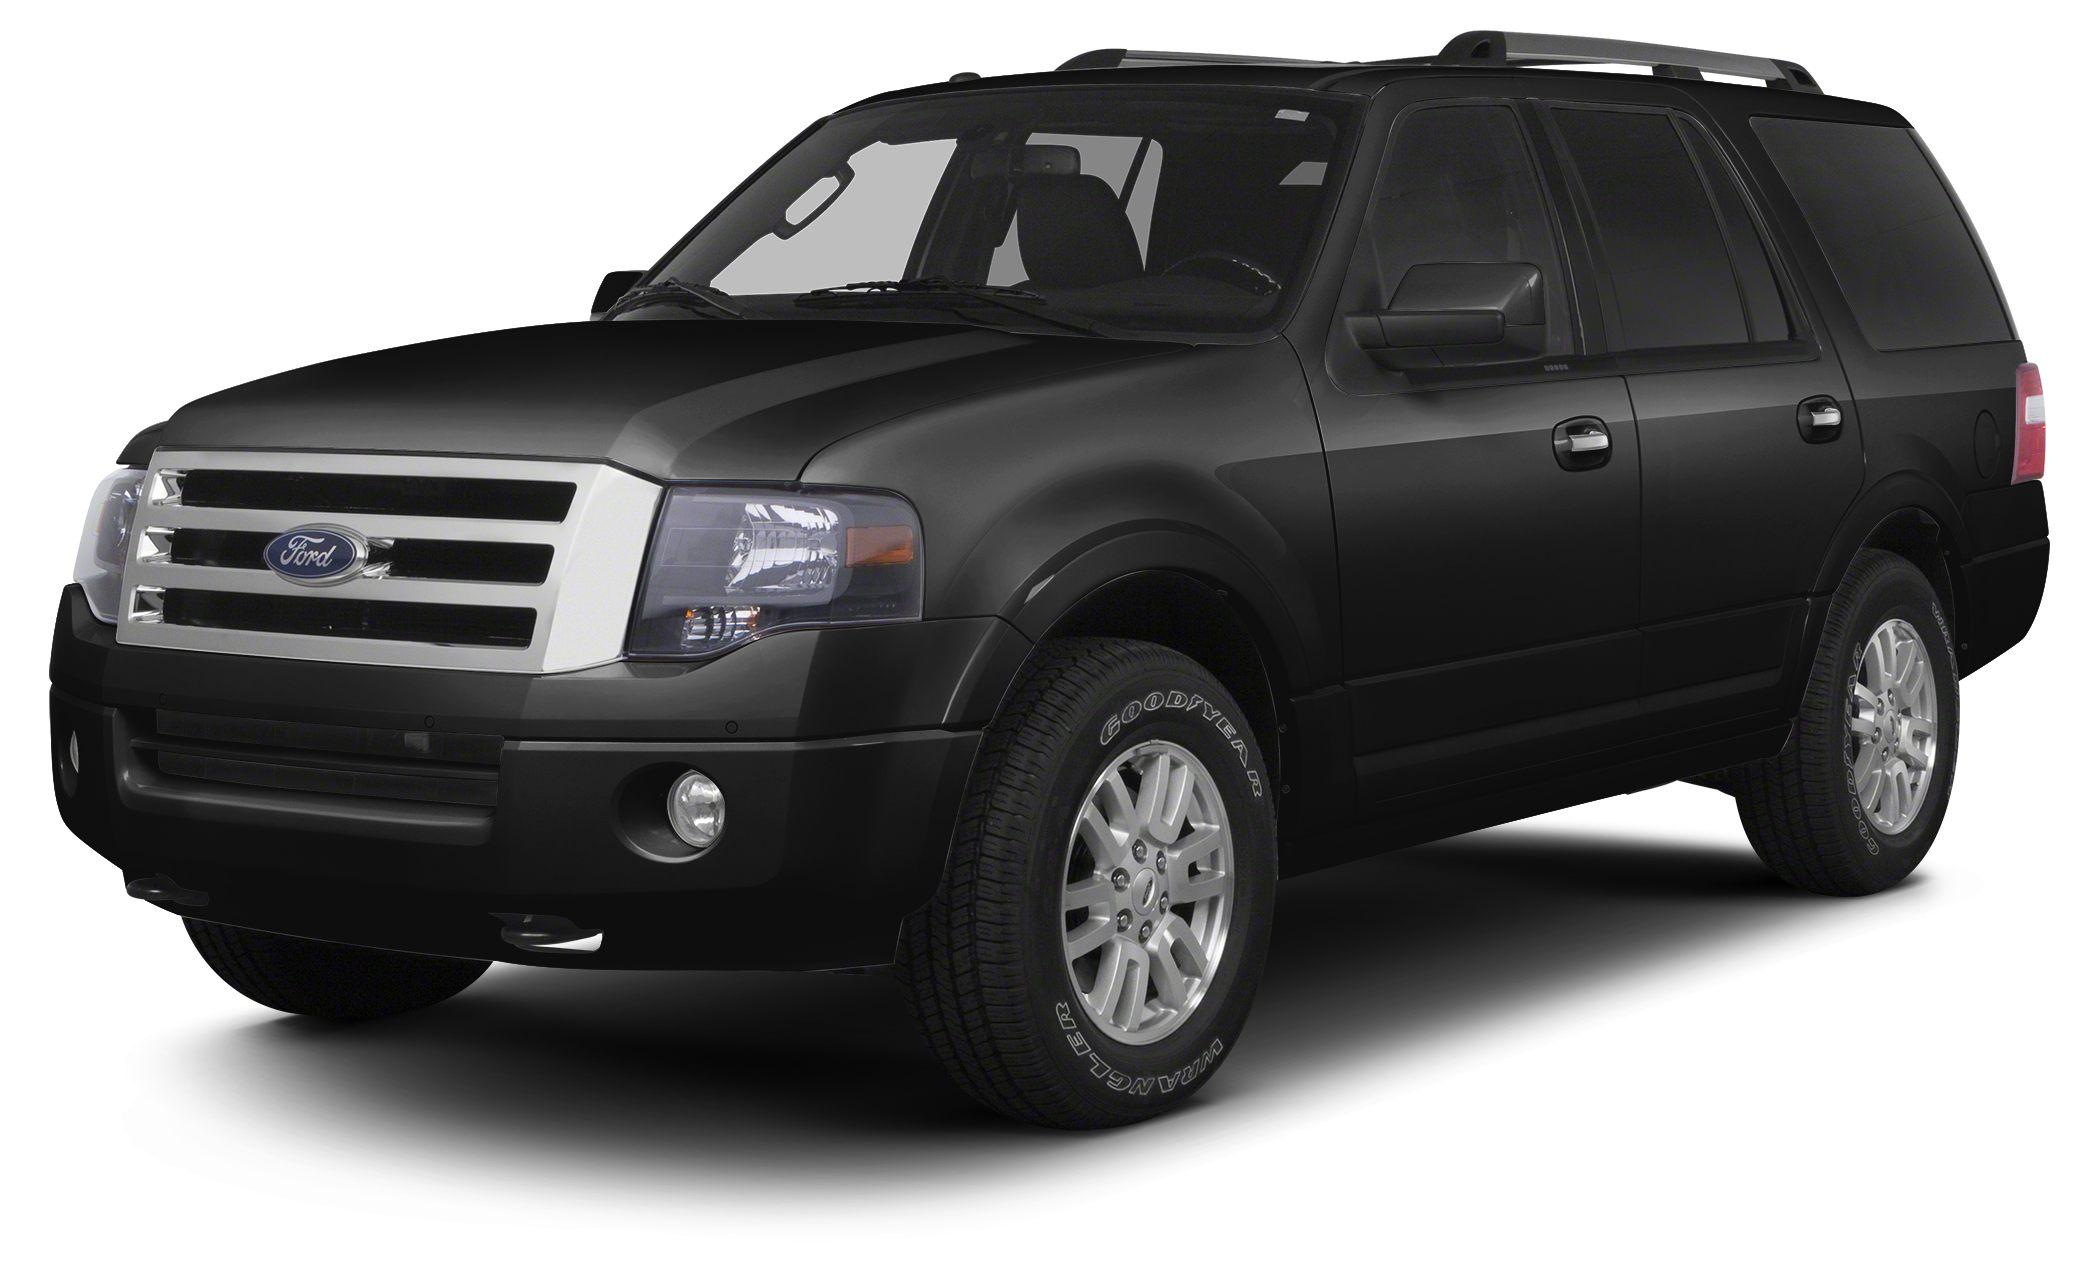 2013 Ford Expedition XLT Miles 64538Color Black Stock 16Z27A VIN 1FMJU1H50DEF17835